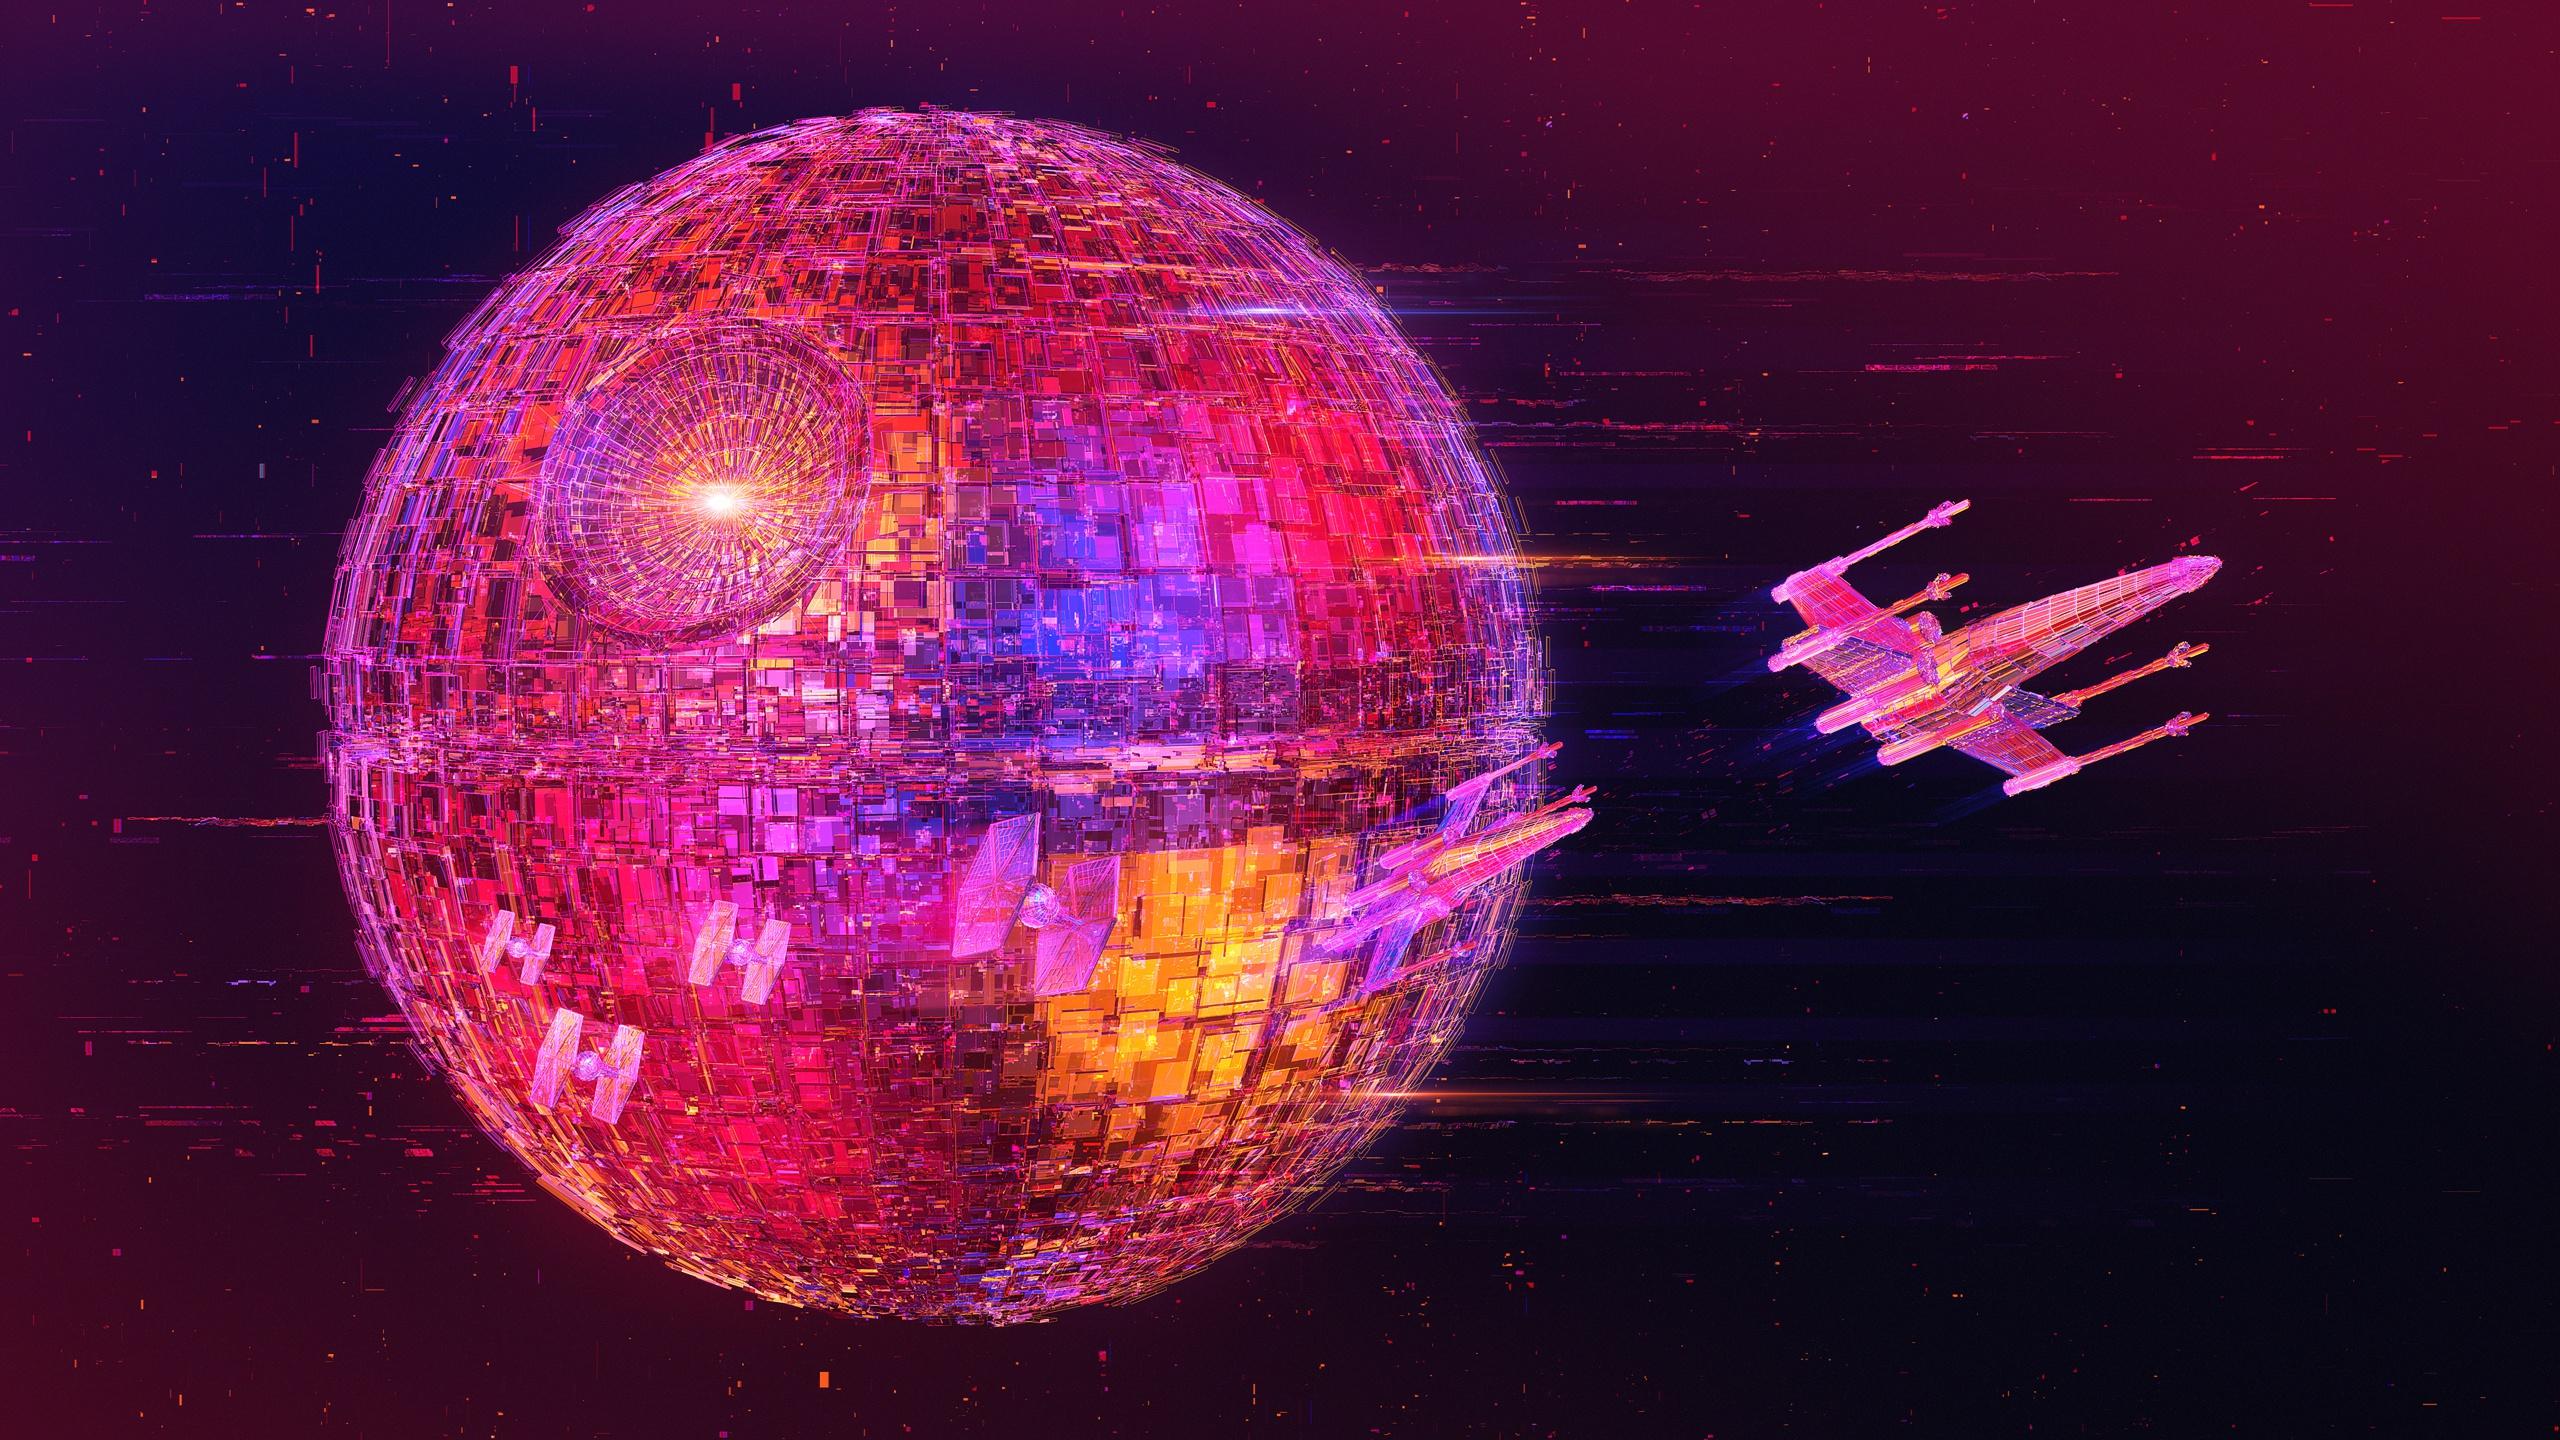 Star Wars digital art X wing TIE Fighter Death Star neon artwork science fiction 1616281